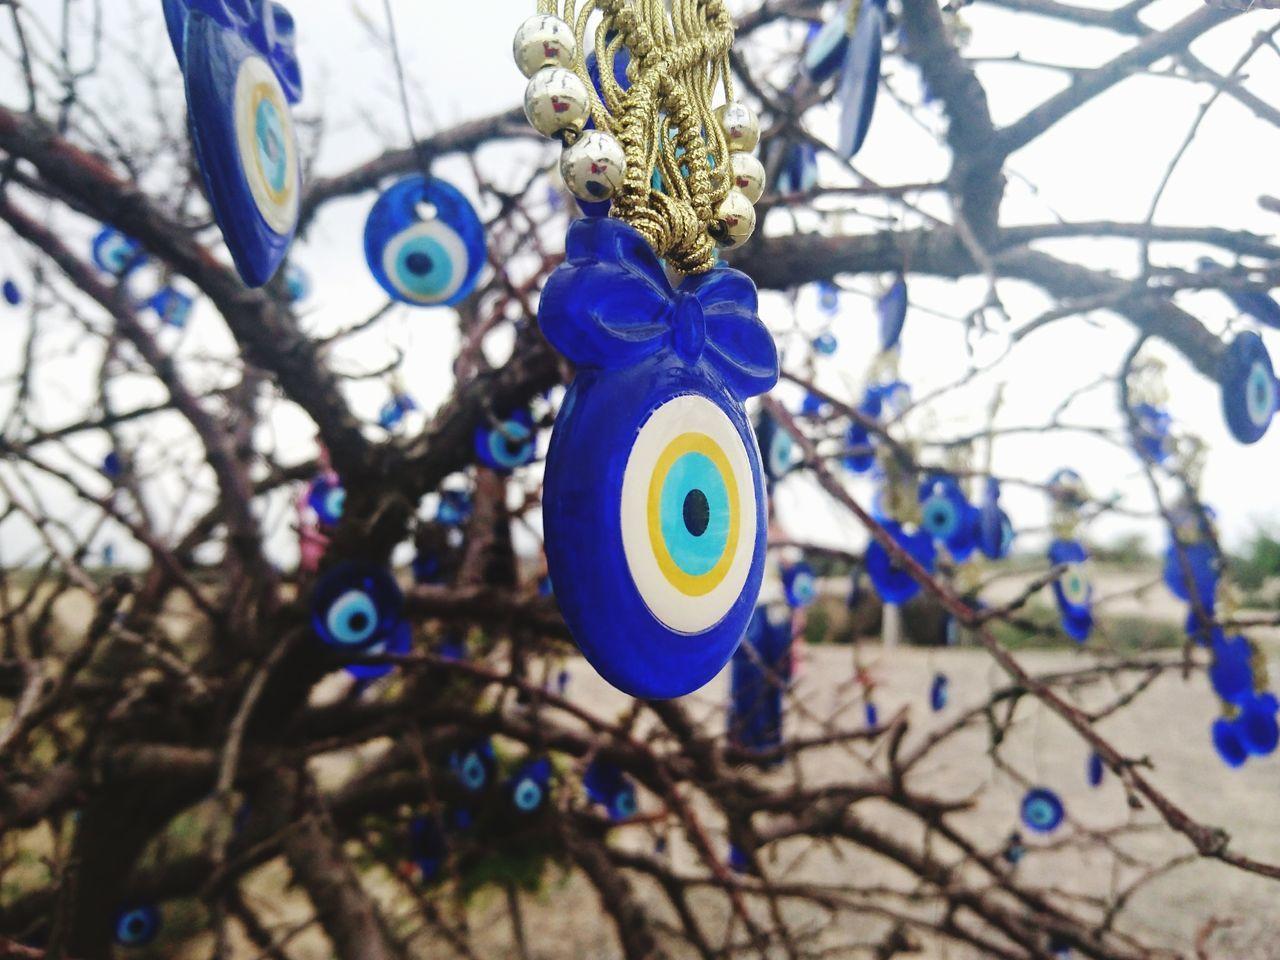 Blue Evil Eye Wish Tree Blueeye Talisman Turkisheye Tradition Turkey Wish Tree Cappadocia Mobile Photography Blue Colours No People Close-up Outdoors Tree Decoration Cappadocia/Turkey